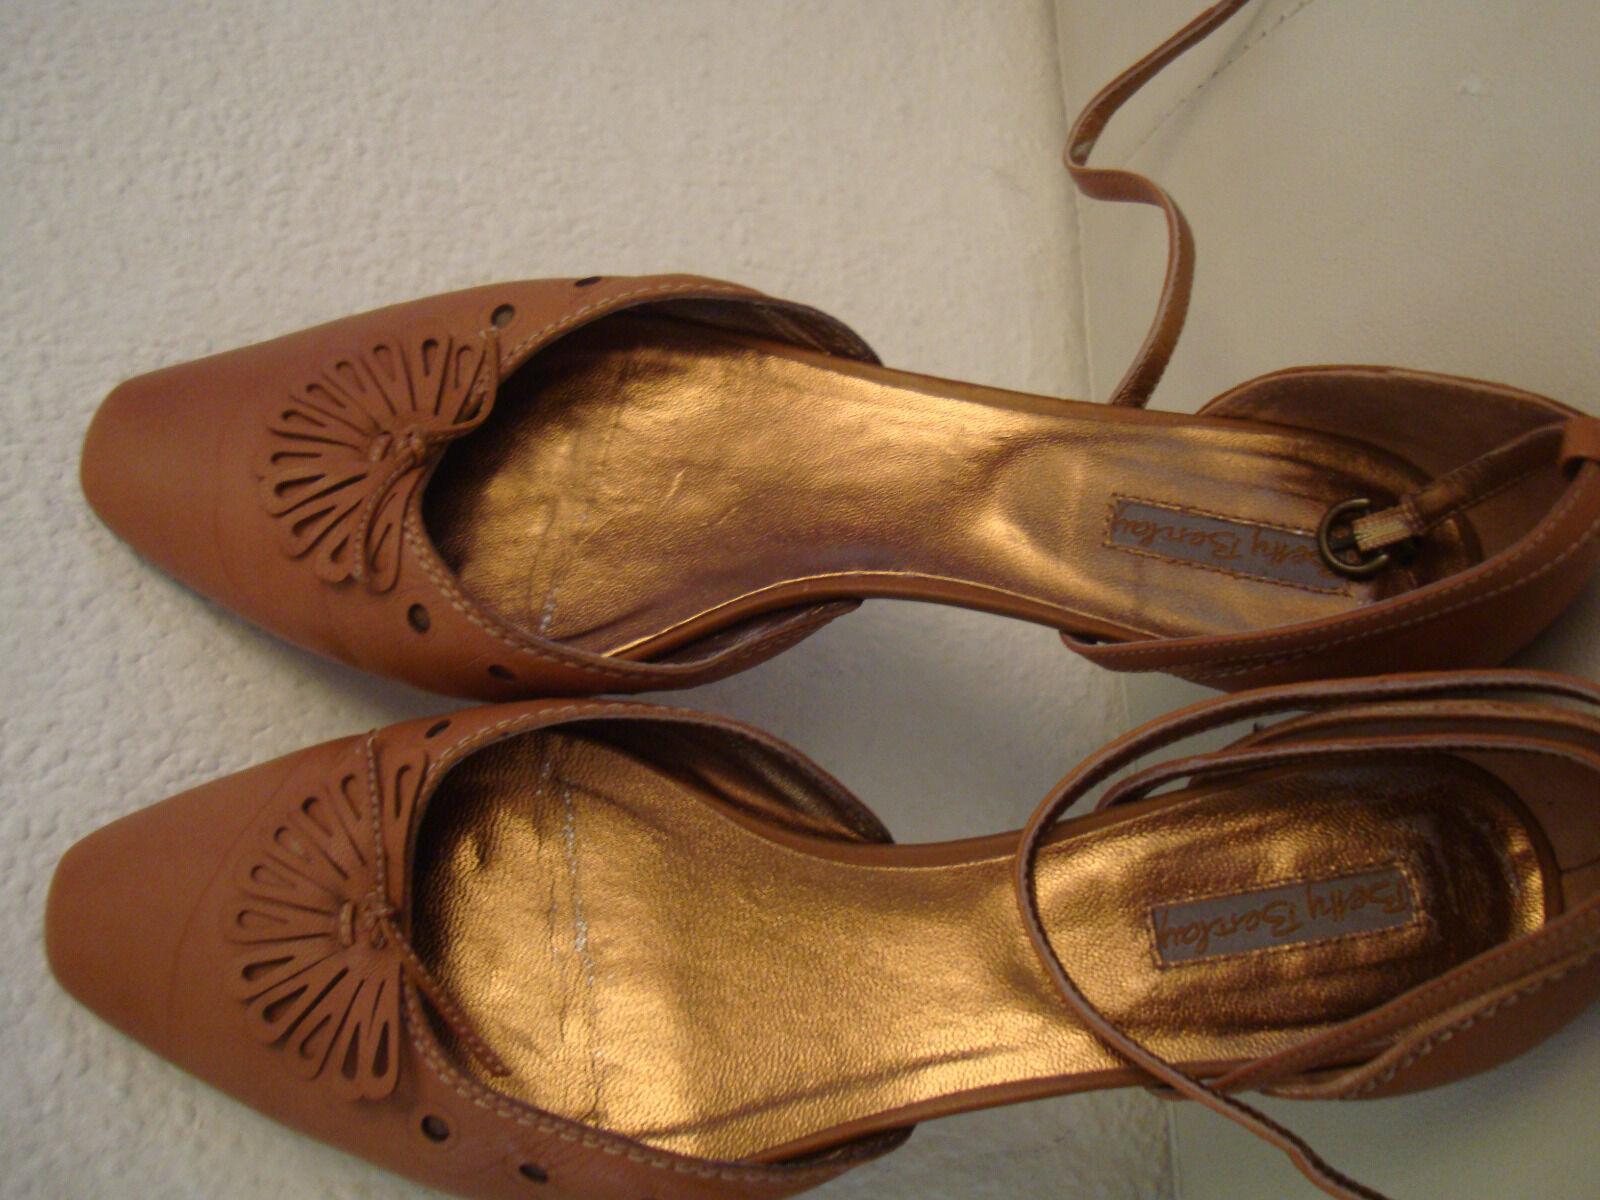 Betty Barclay Marken-Ballerina hell-braun Damen-Schuhe in Größe 41